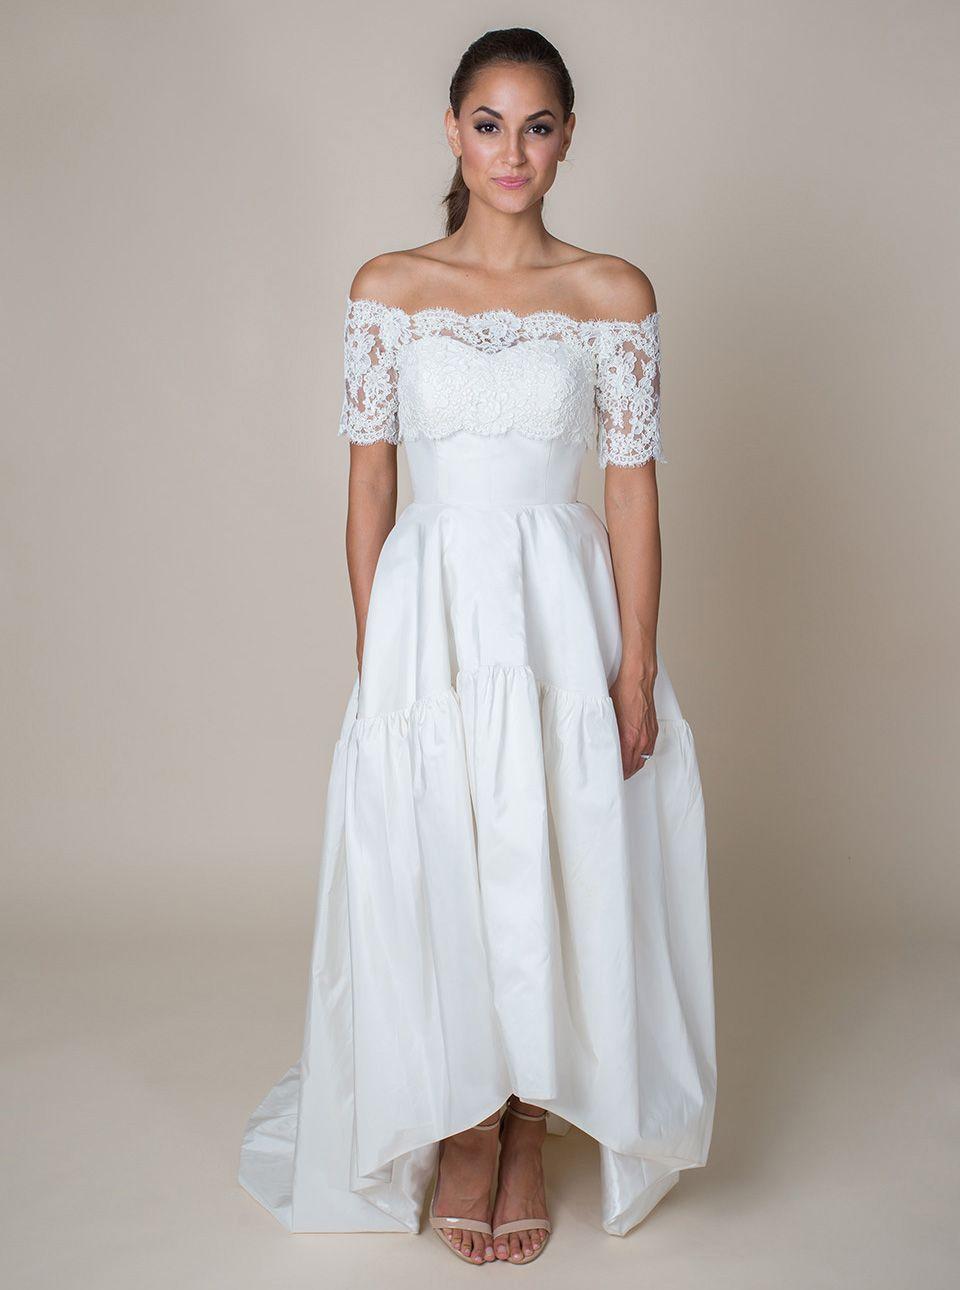 crop top wedding dress Katrina Arnold Chloe Crop Top Classic and feminine the Chloe Crop Top